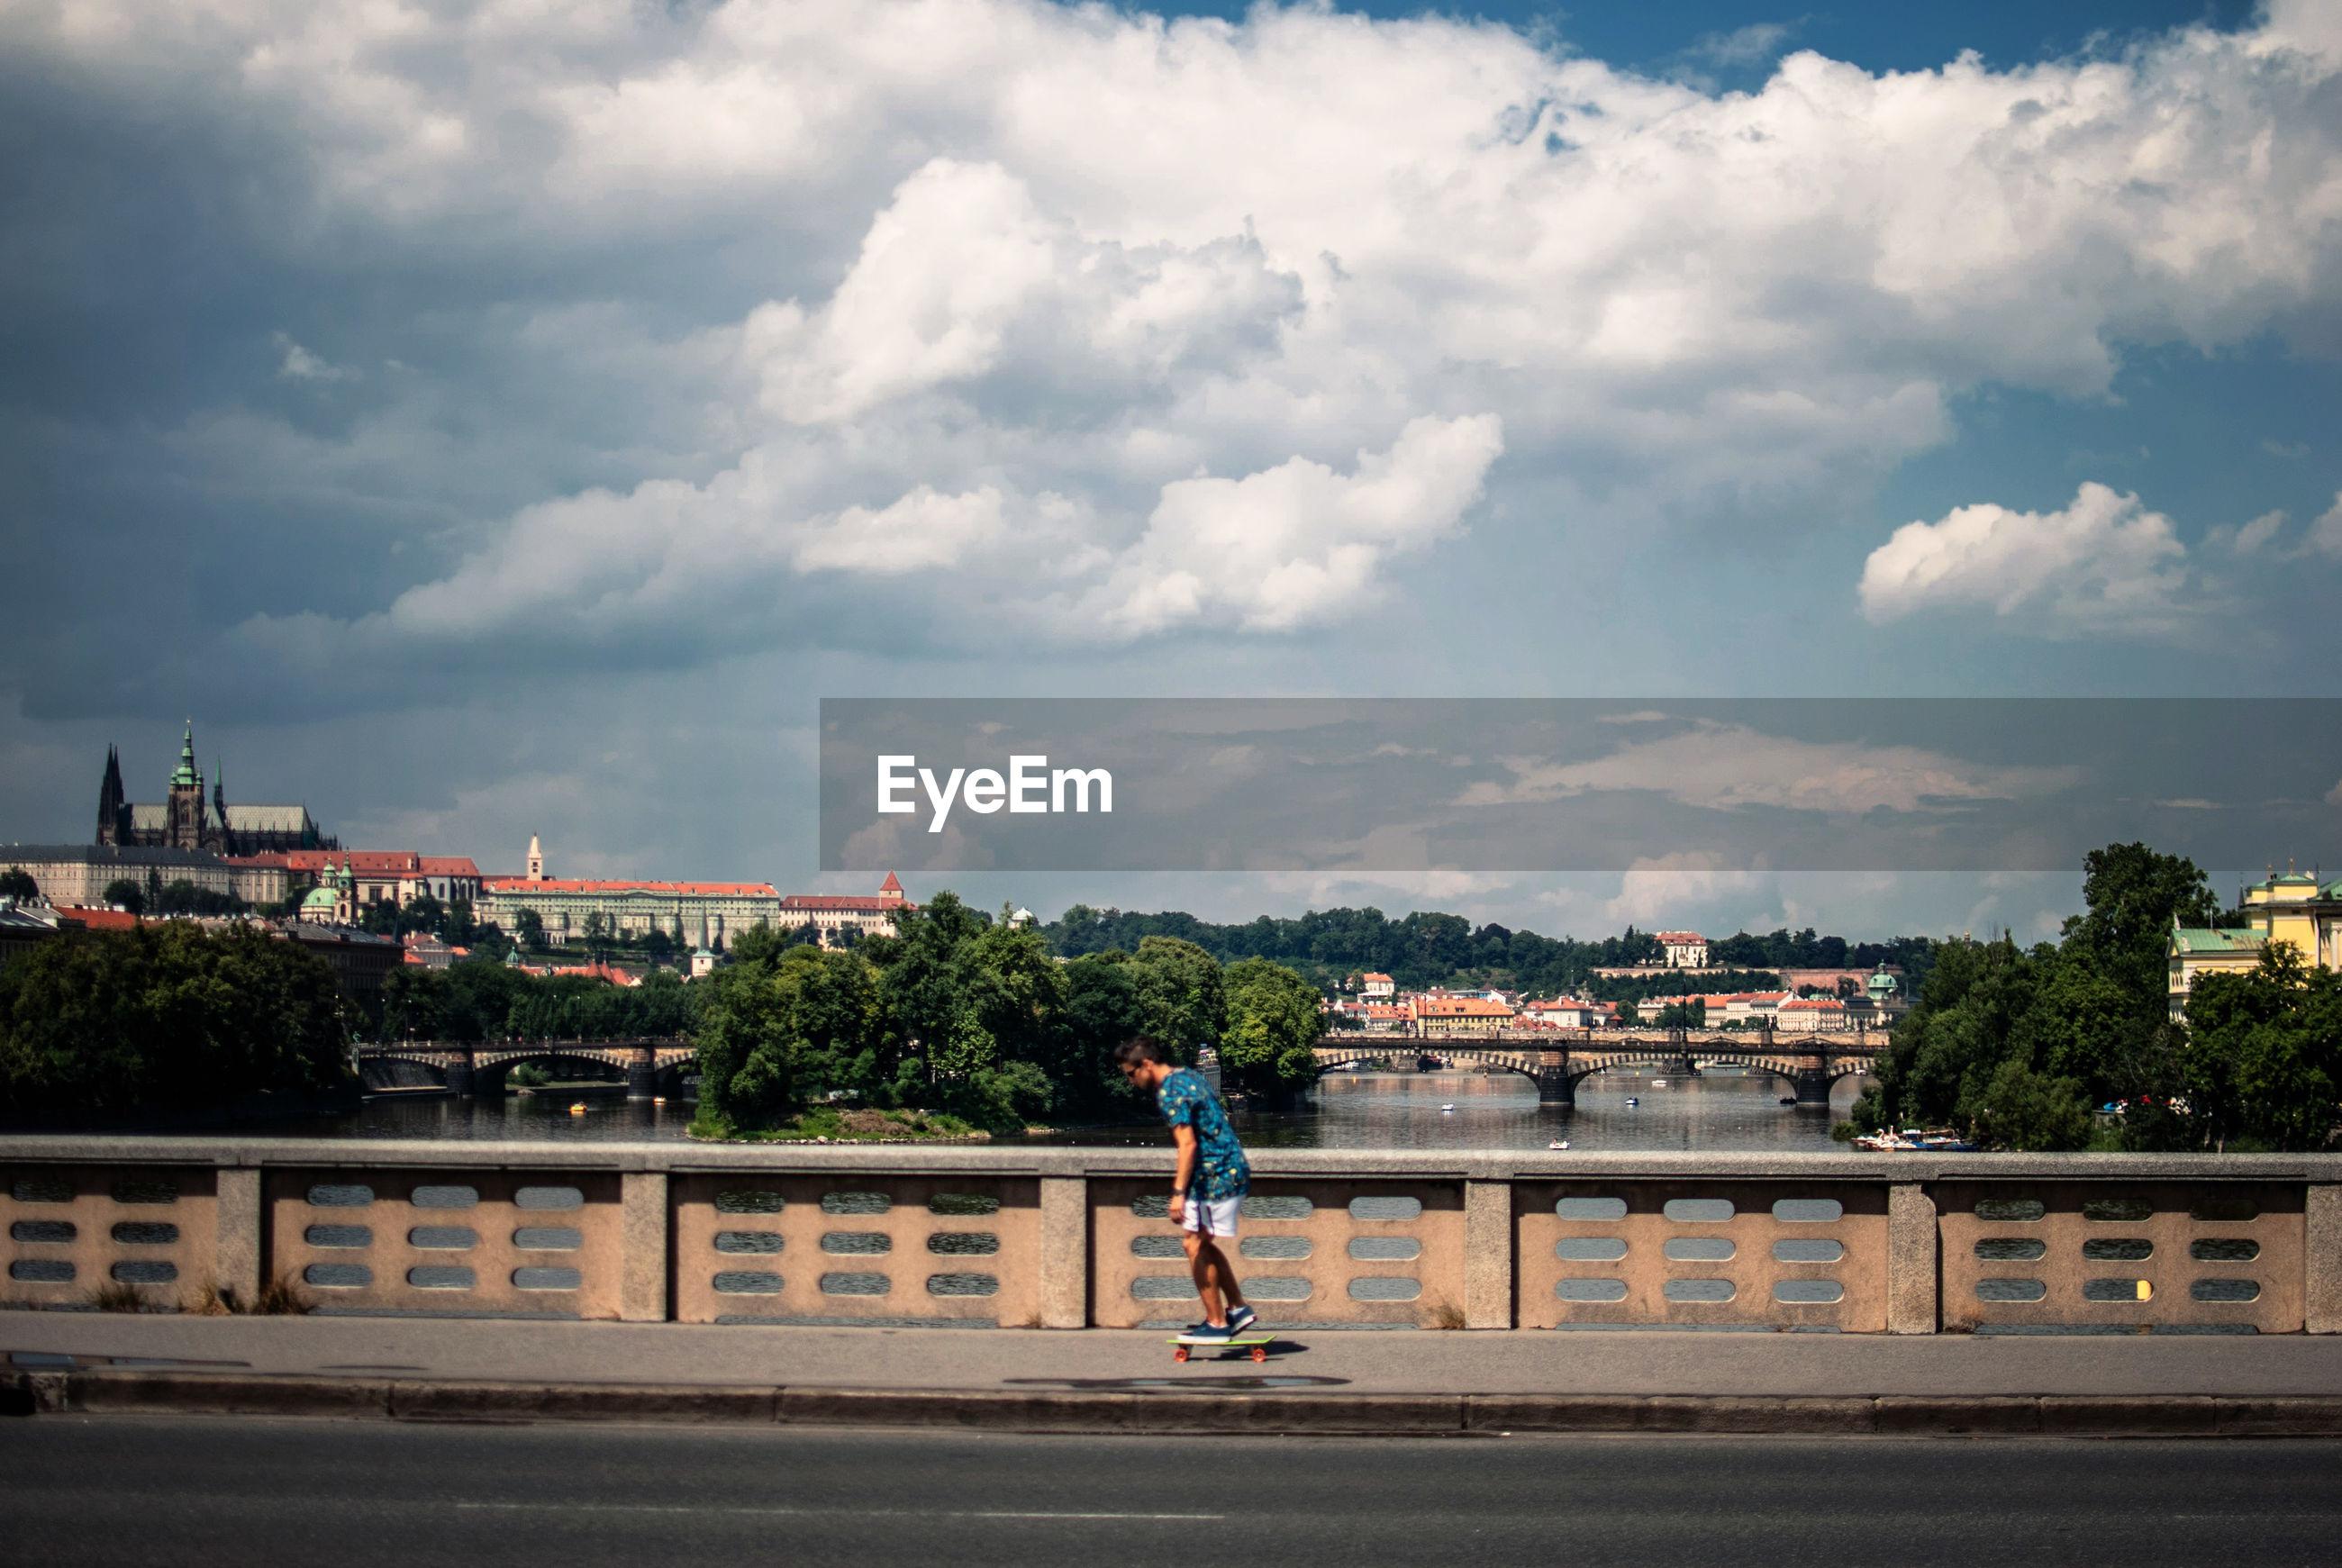 Mid distance view of man skateboarding on sidewalk at bridge against cloudy sky